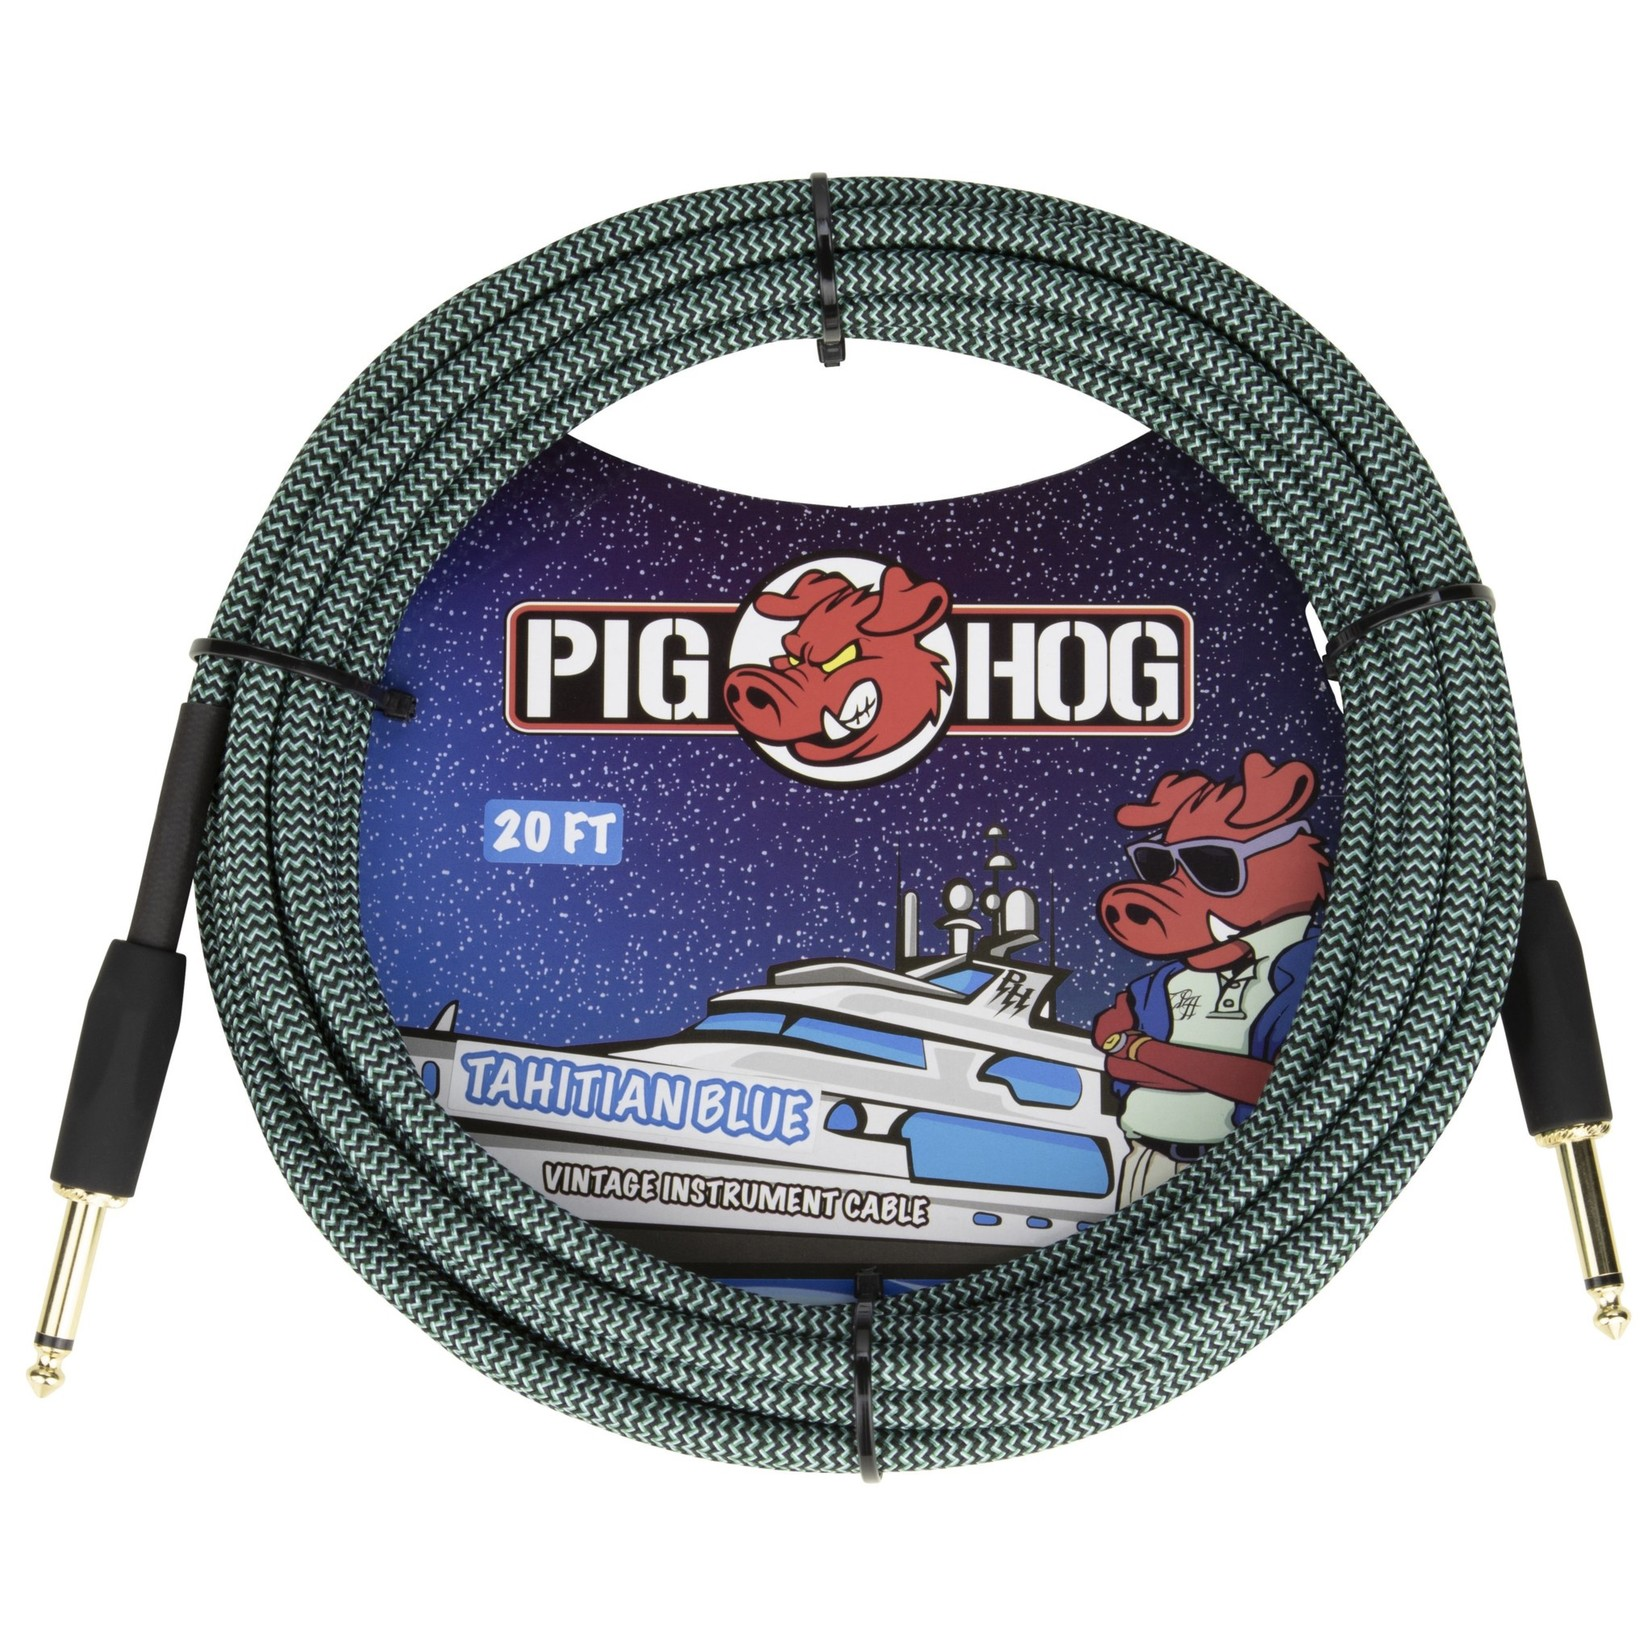 "Pig Hog Pig Hog 20-Foot Vintage Woven Instrument Cable, 1/4"" Straight-Straight, Tahitian Blue"